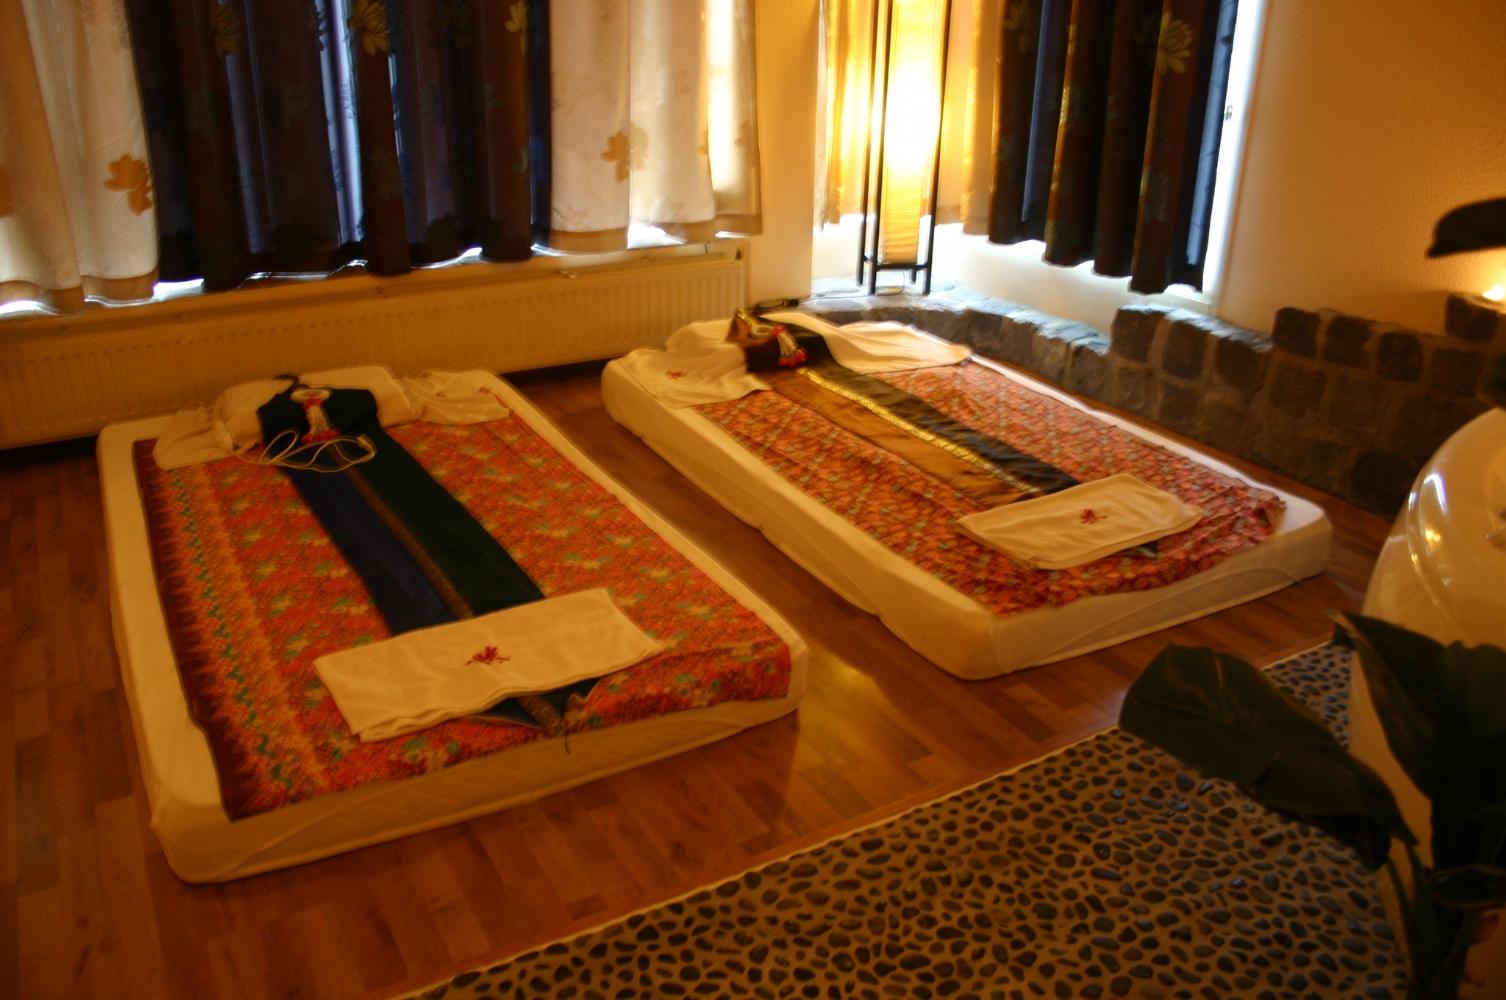 Duo massage in kamer 39 phuket 39 nijmegen 2 persoons manadrin spa - Spa kamer ...